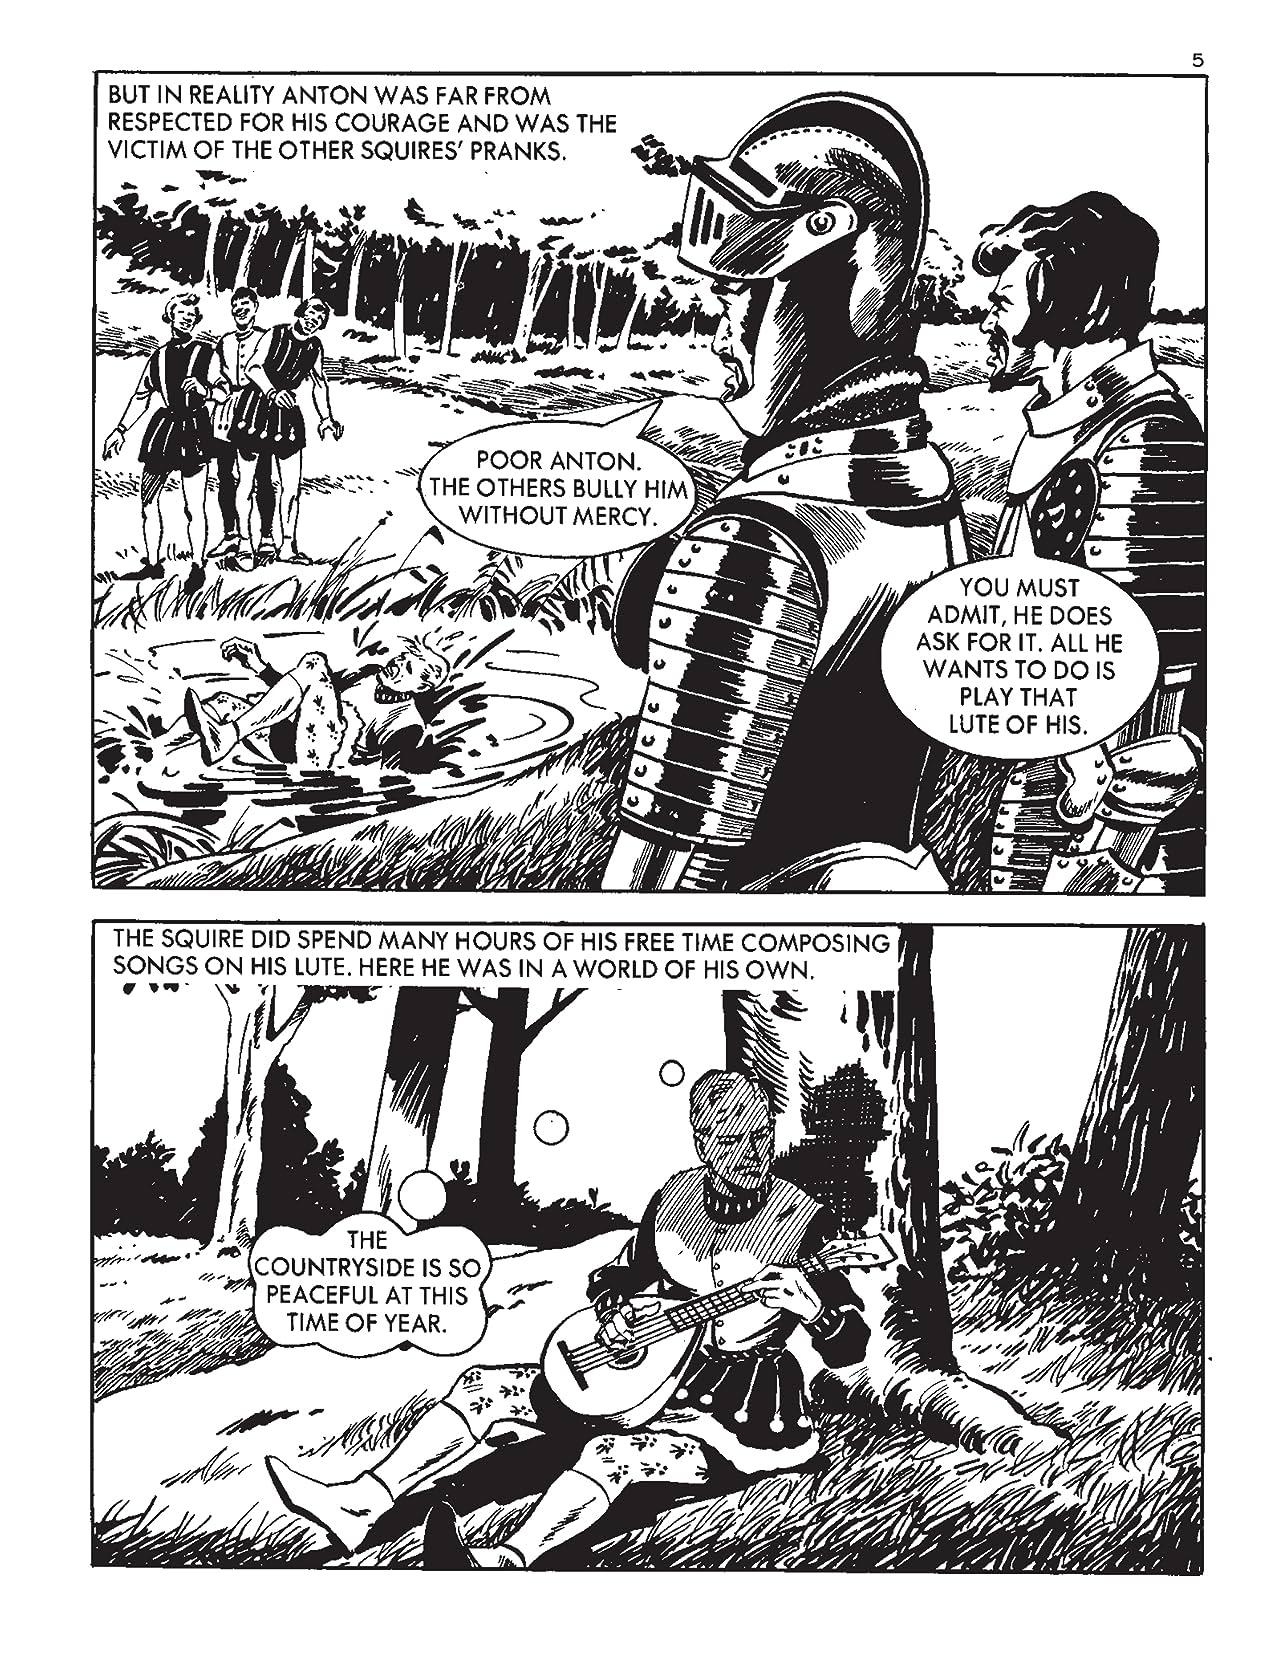 Commando #5370: Bravery!